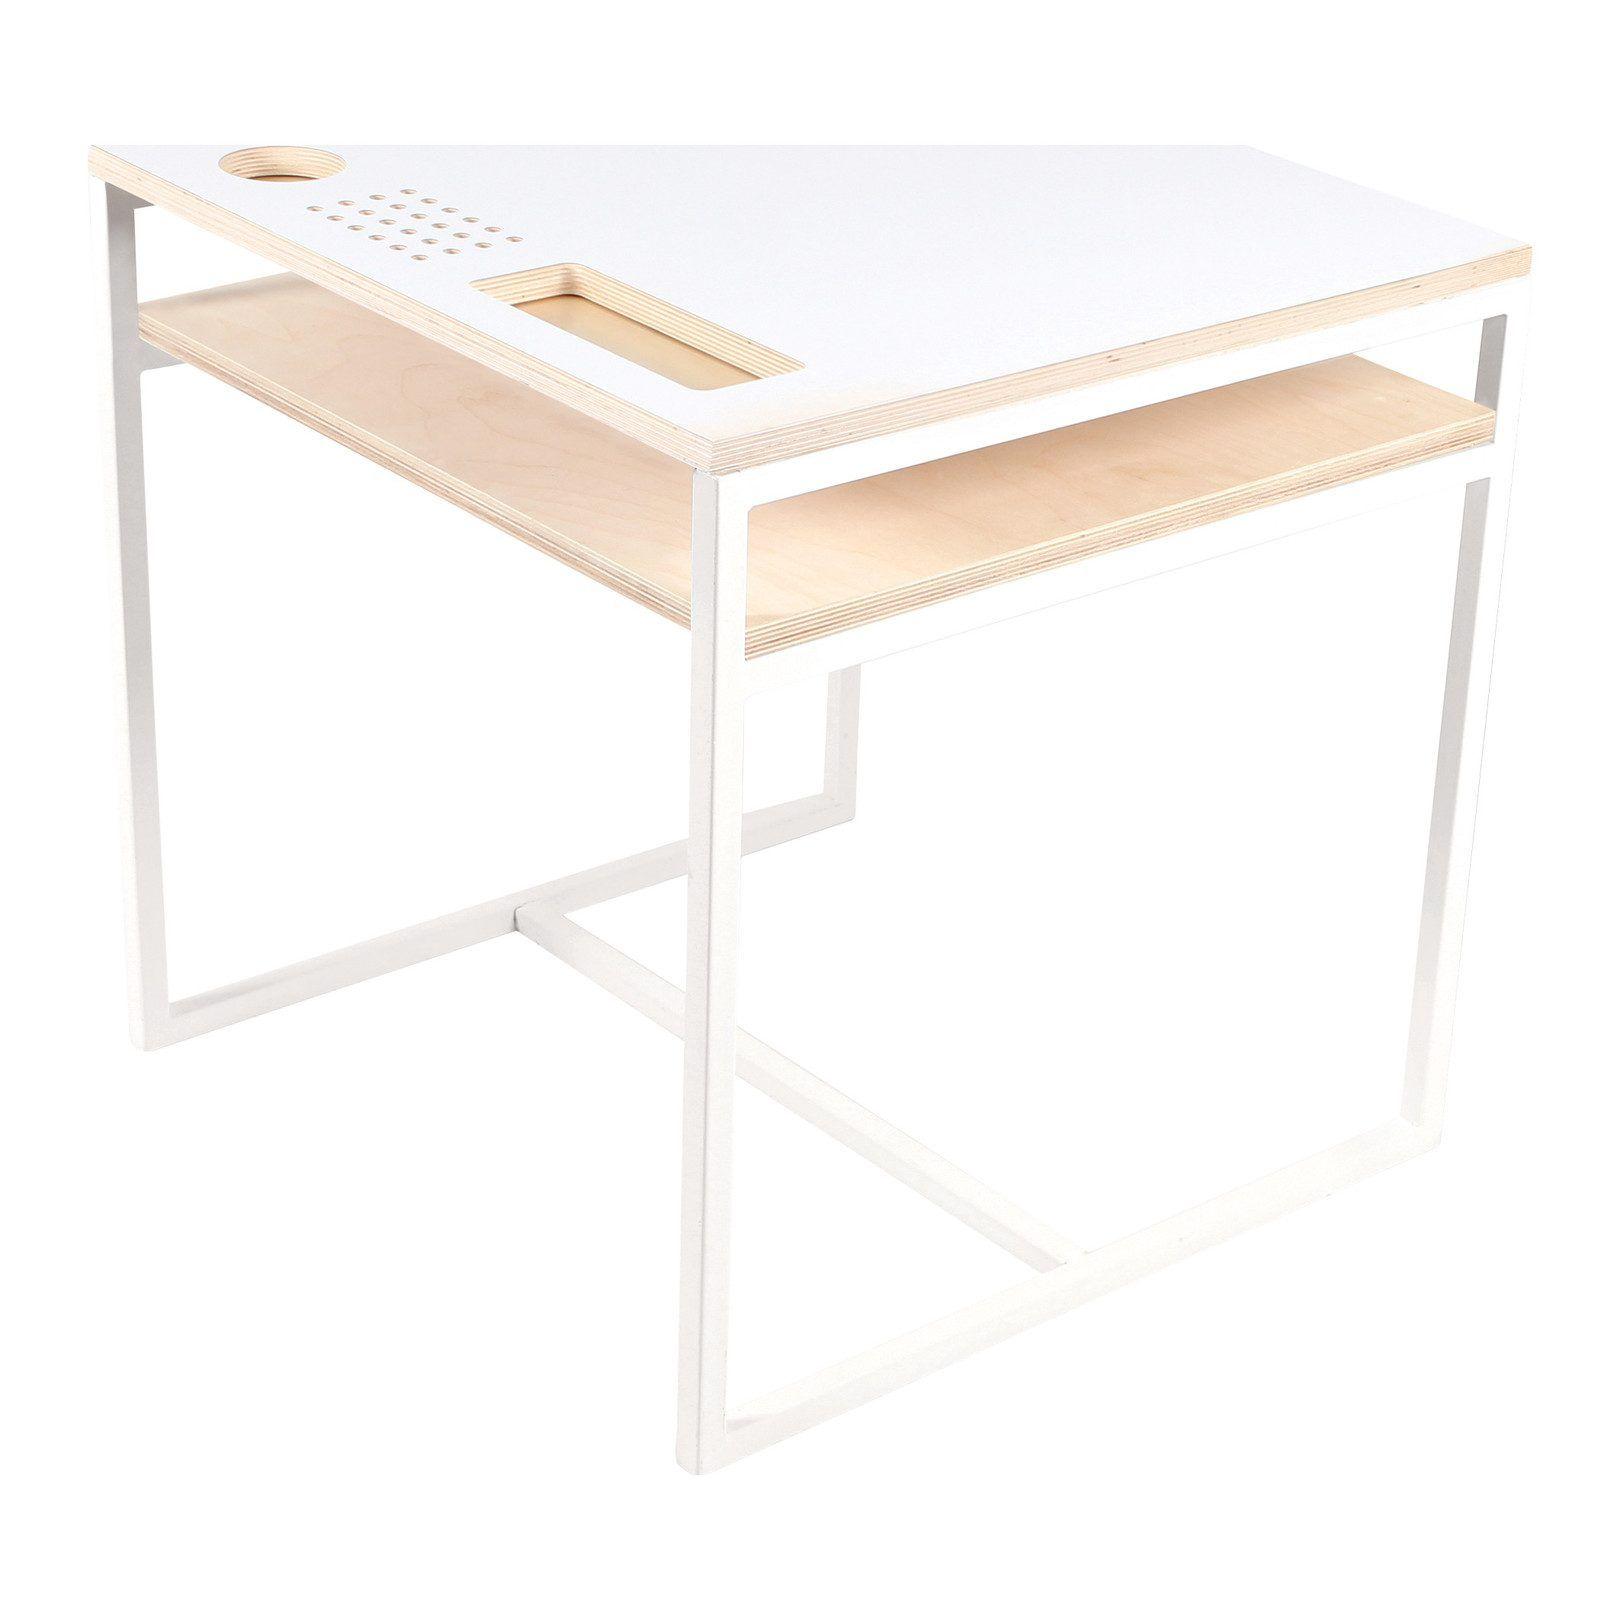 Loft bed with desk south africa  Gautier Studio Nouga Desk White  Pinterest  Desks Baltic birch